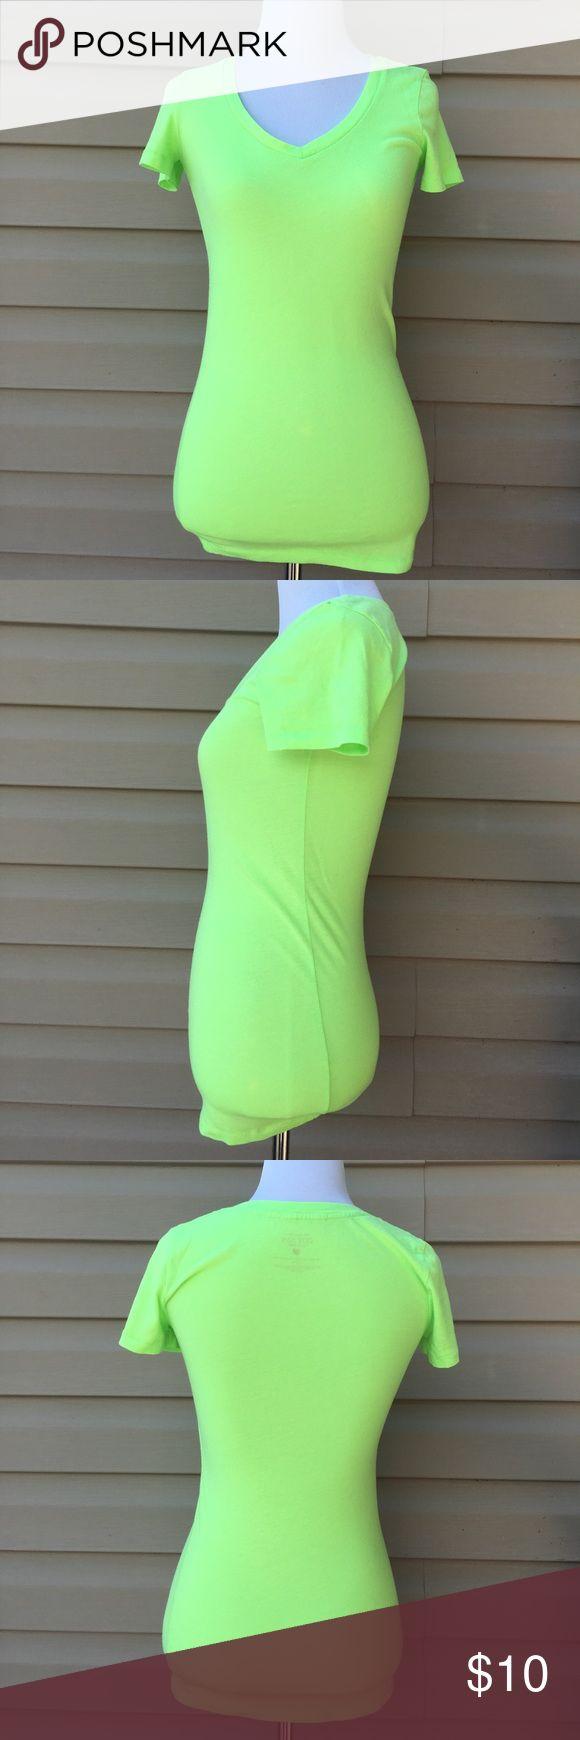 "Victoria's Secret women's cotton lingerie shirt Nice green v- neck shirt 60% cotton 40% polyester, no stains or holes. 14""W x 25""L Victoria's Secret Tops Tees - Short Sleeve"